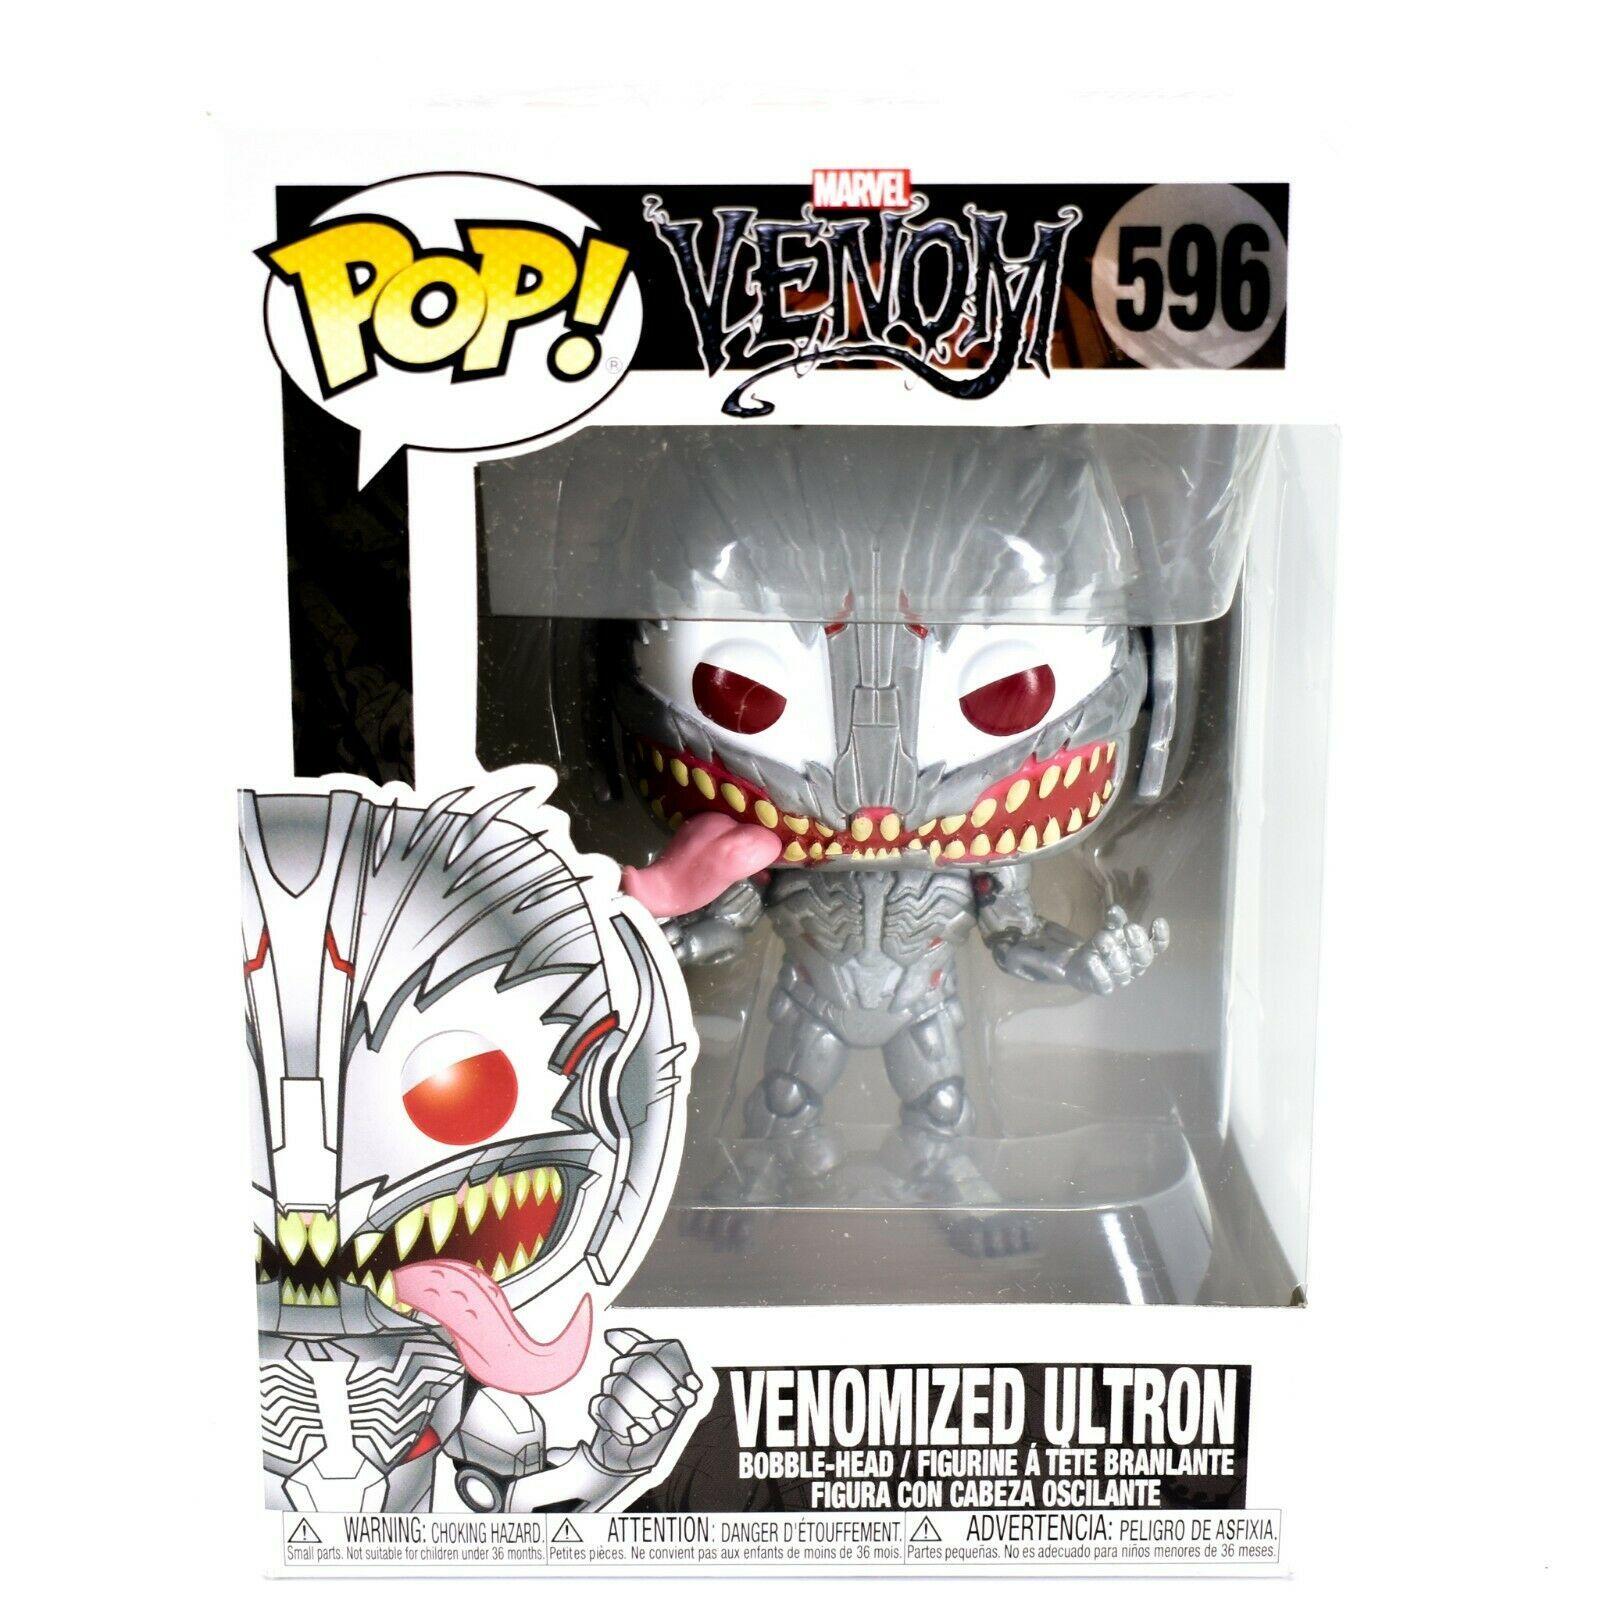 Funko Pop! Marvel Venom Venomized Ultron #596 Bobble-Head Vinyl Action Figure